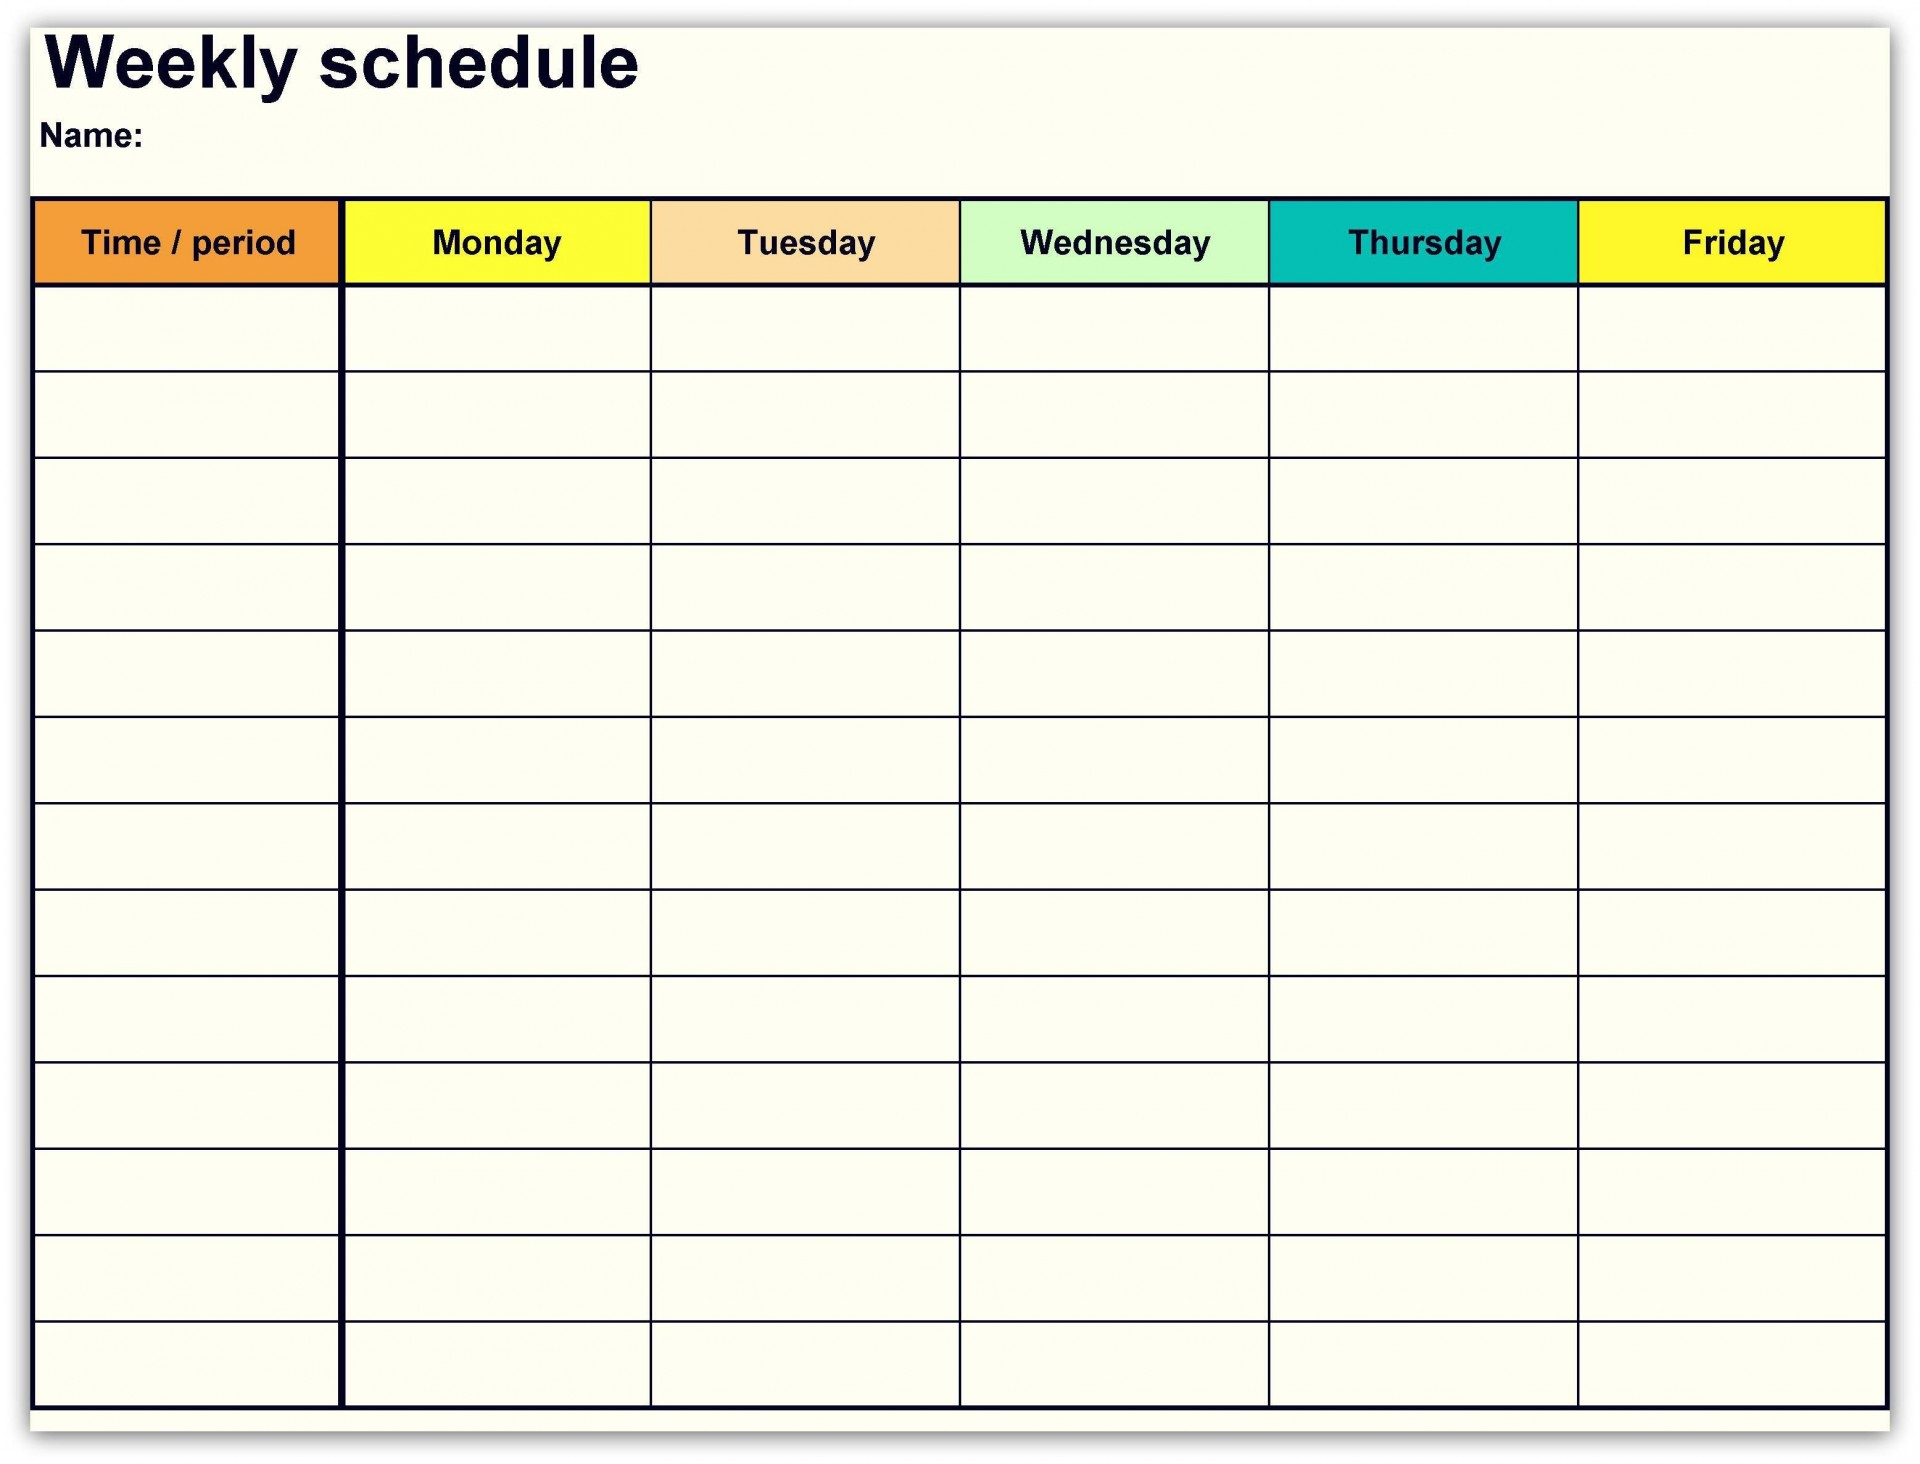 000 Imposing Calendar Template Google Doc Design  Docs Editable Two Week 2019-201920